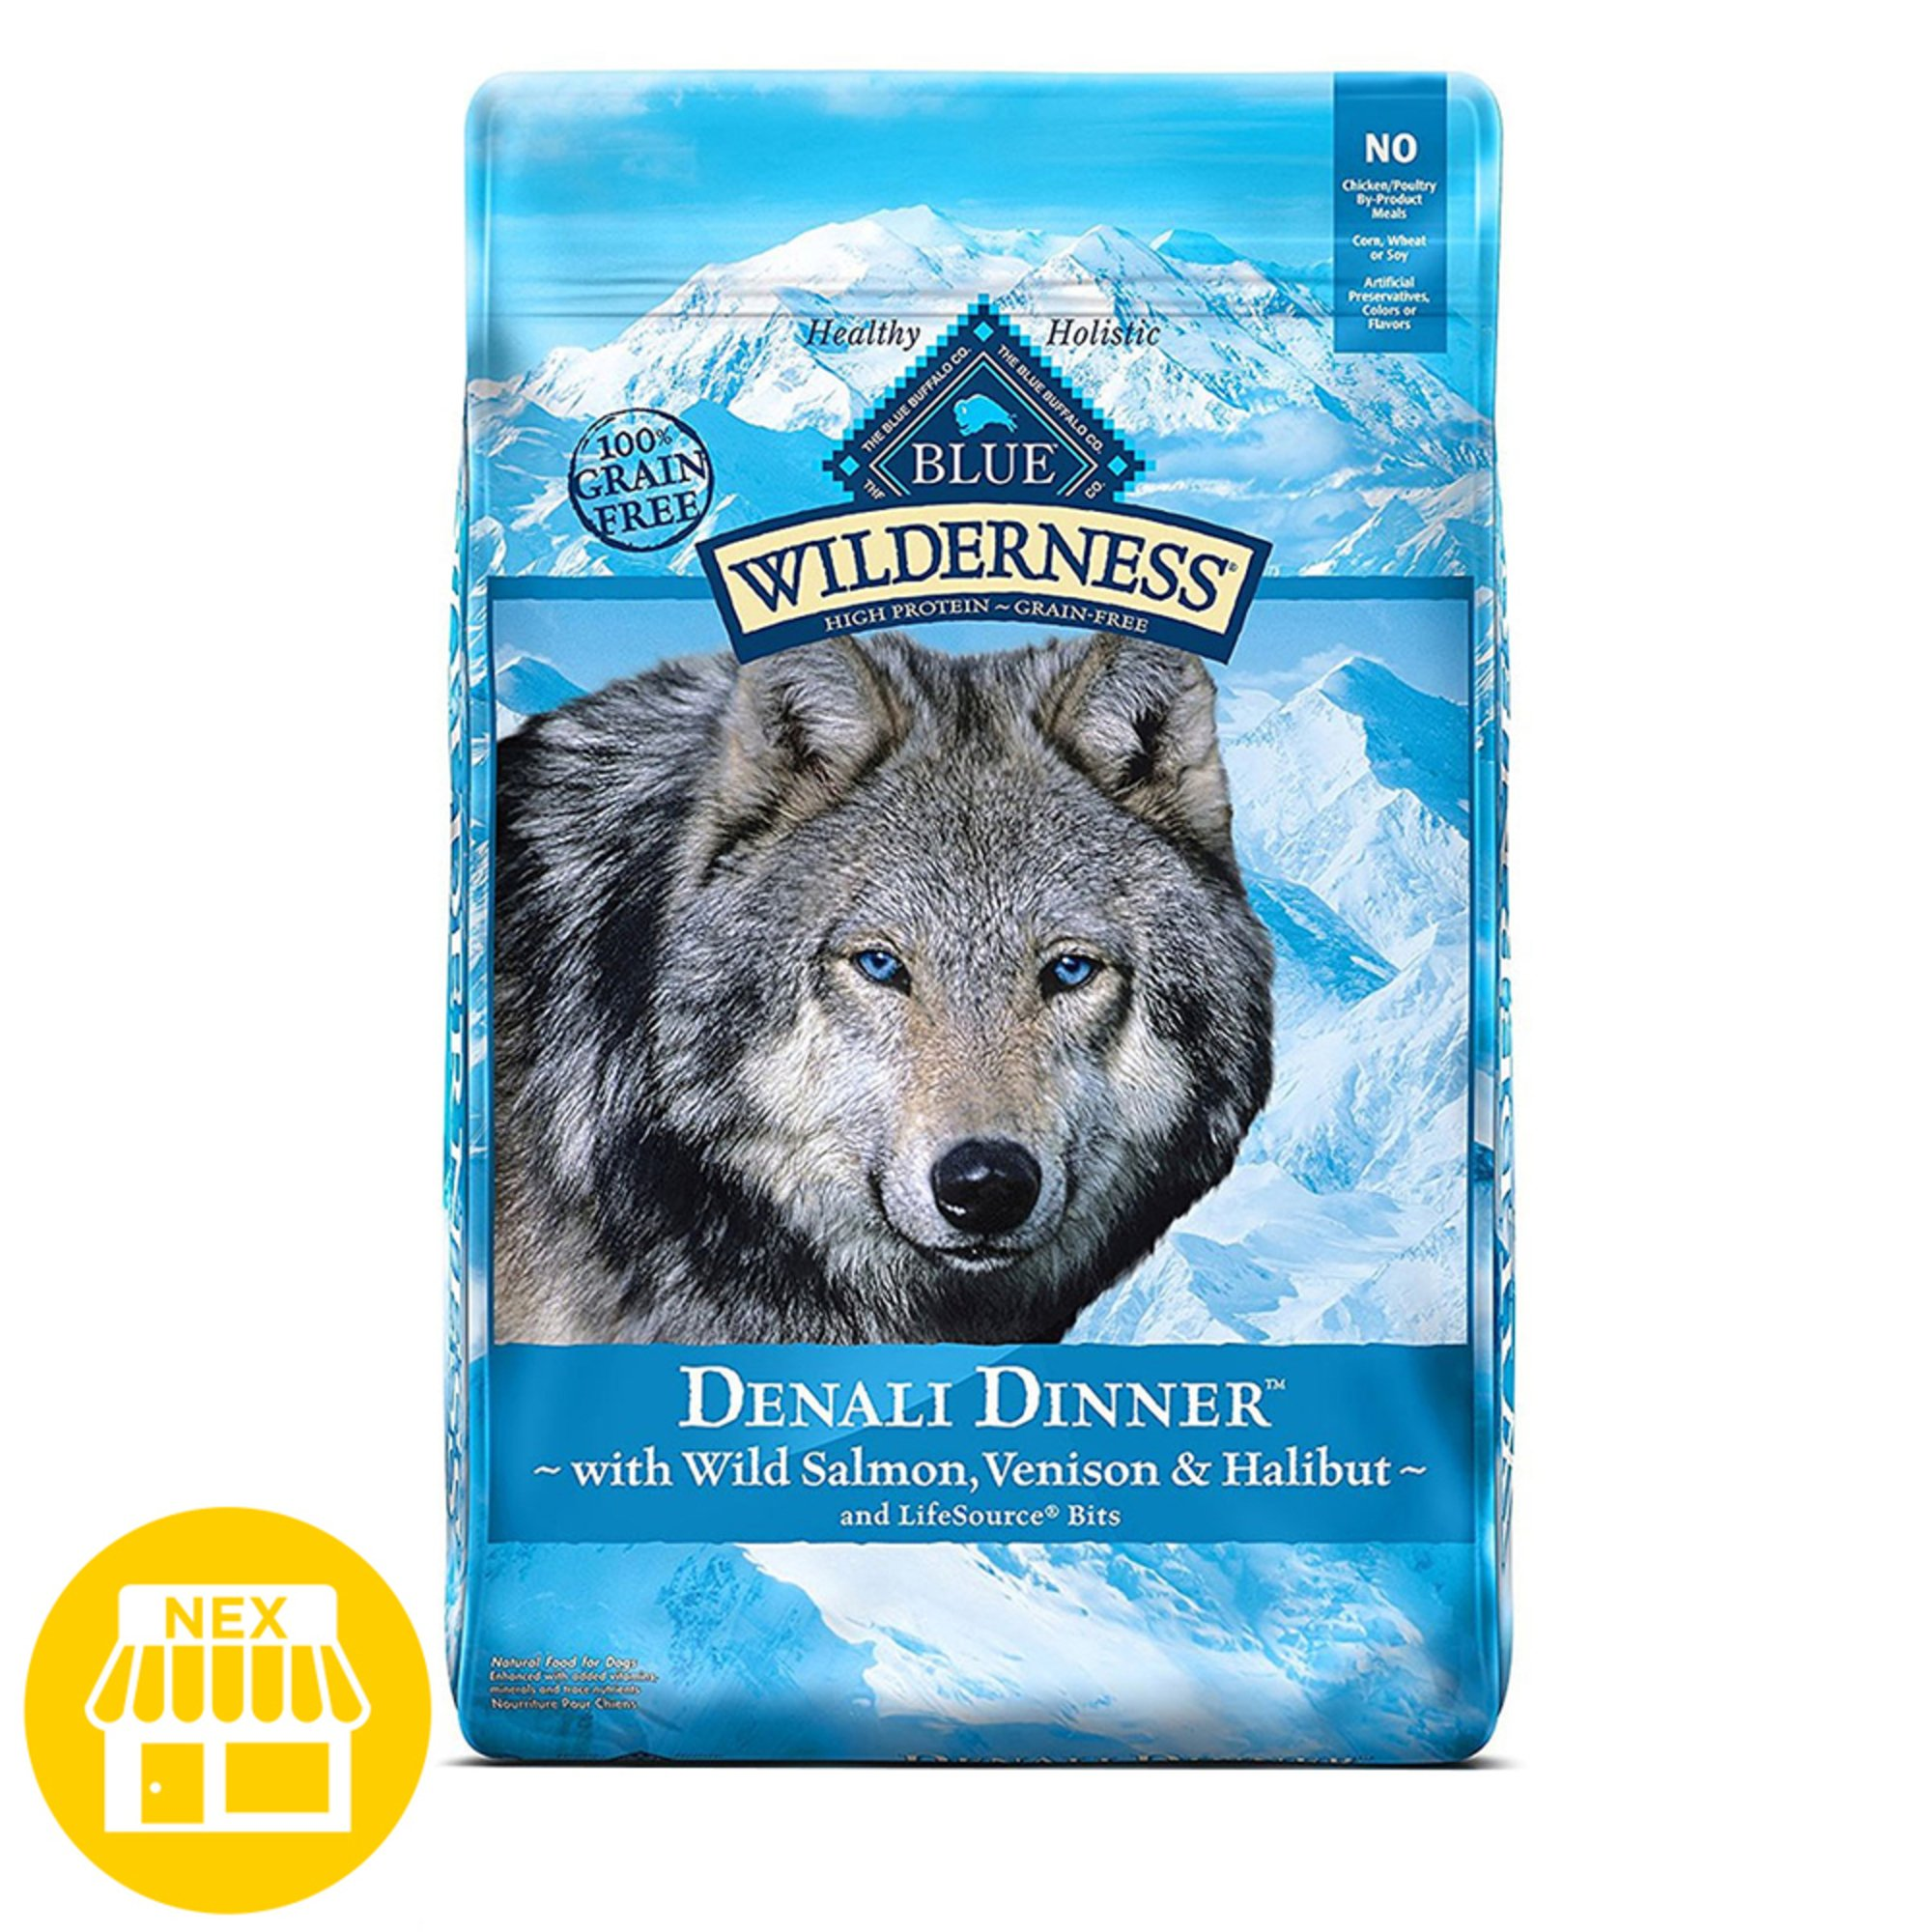 Denali Dinner Dog Food